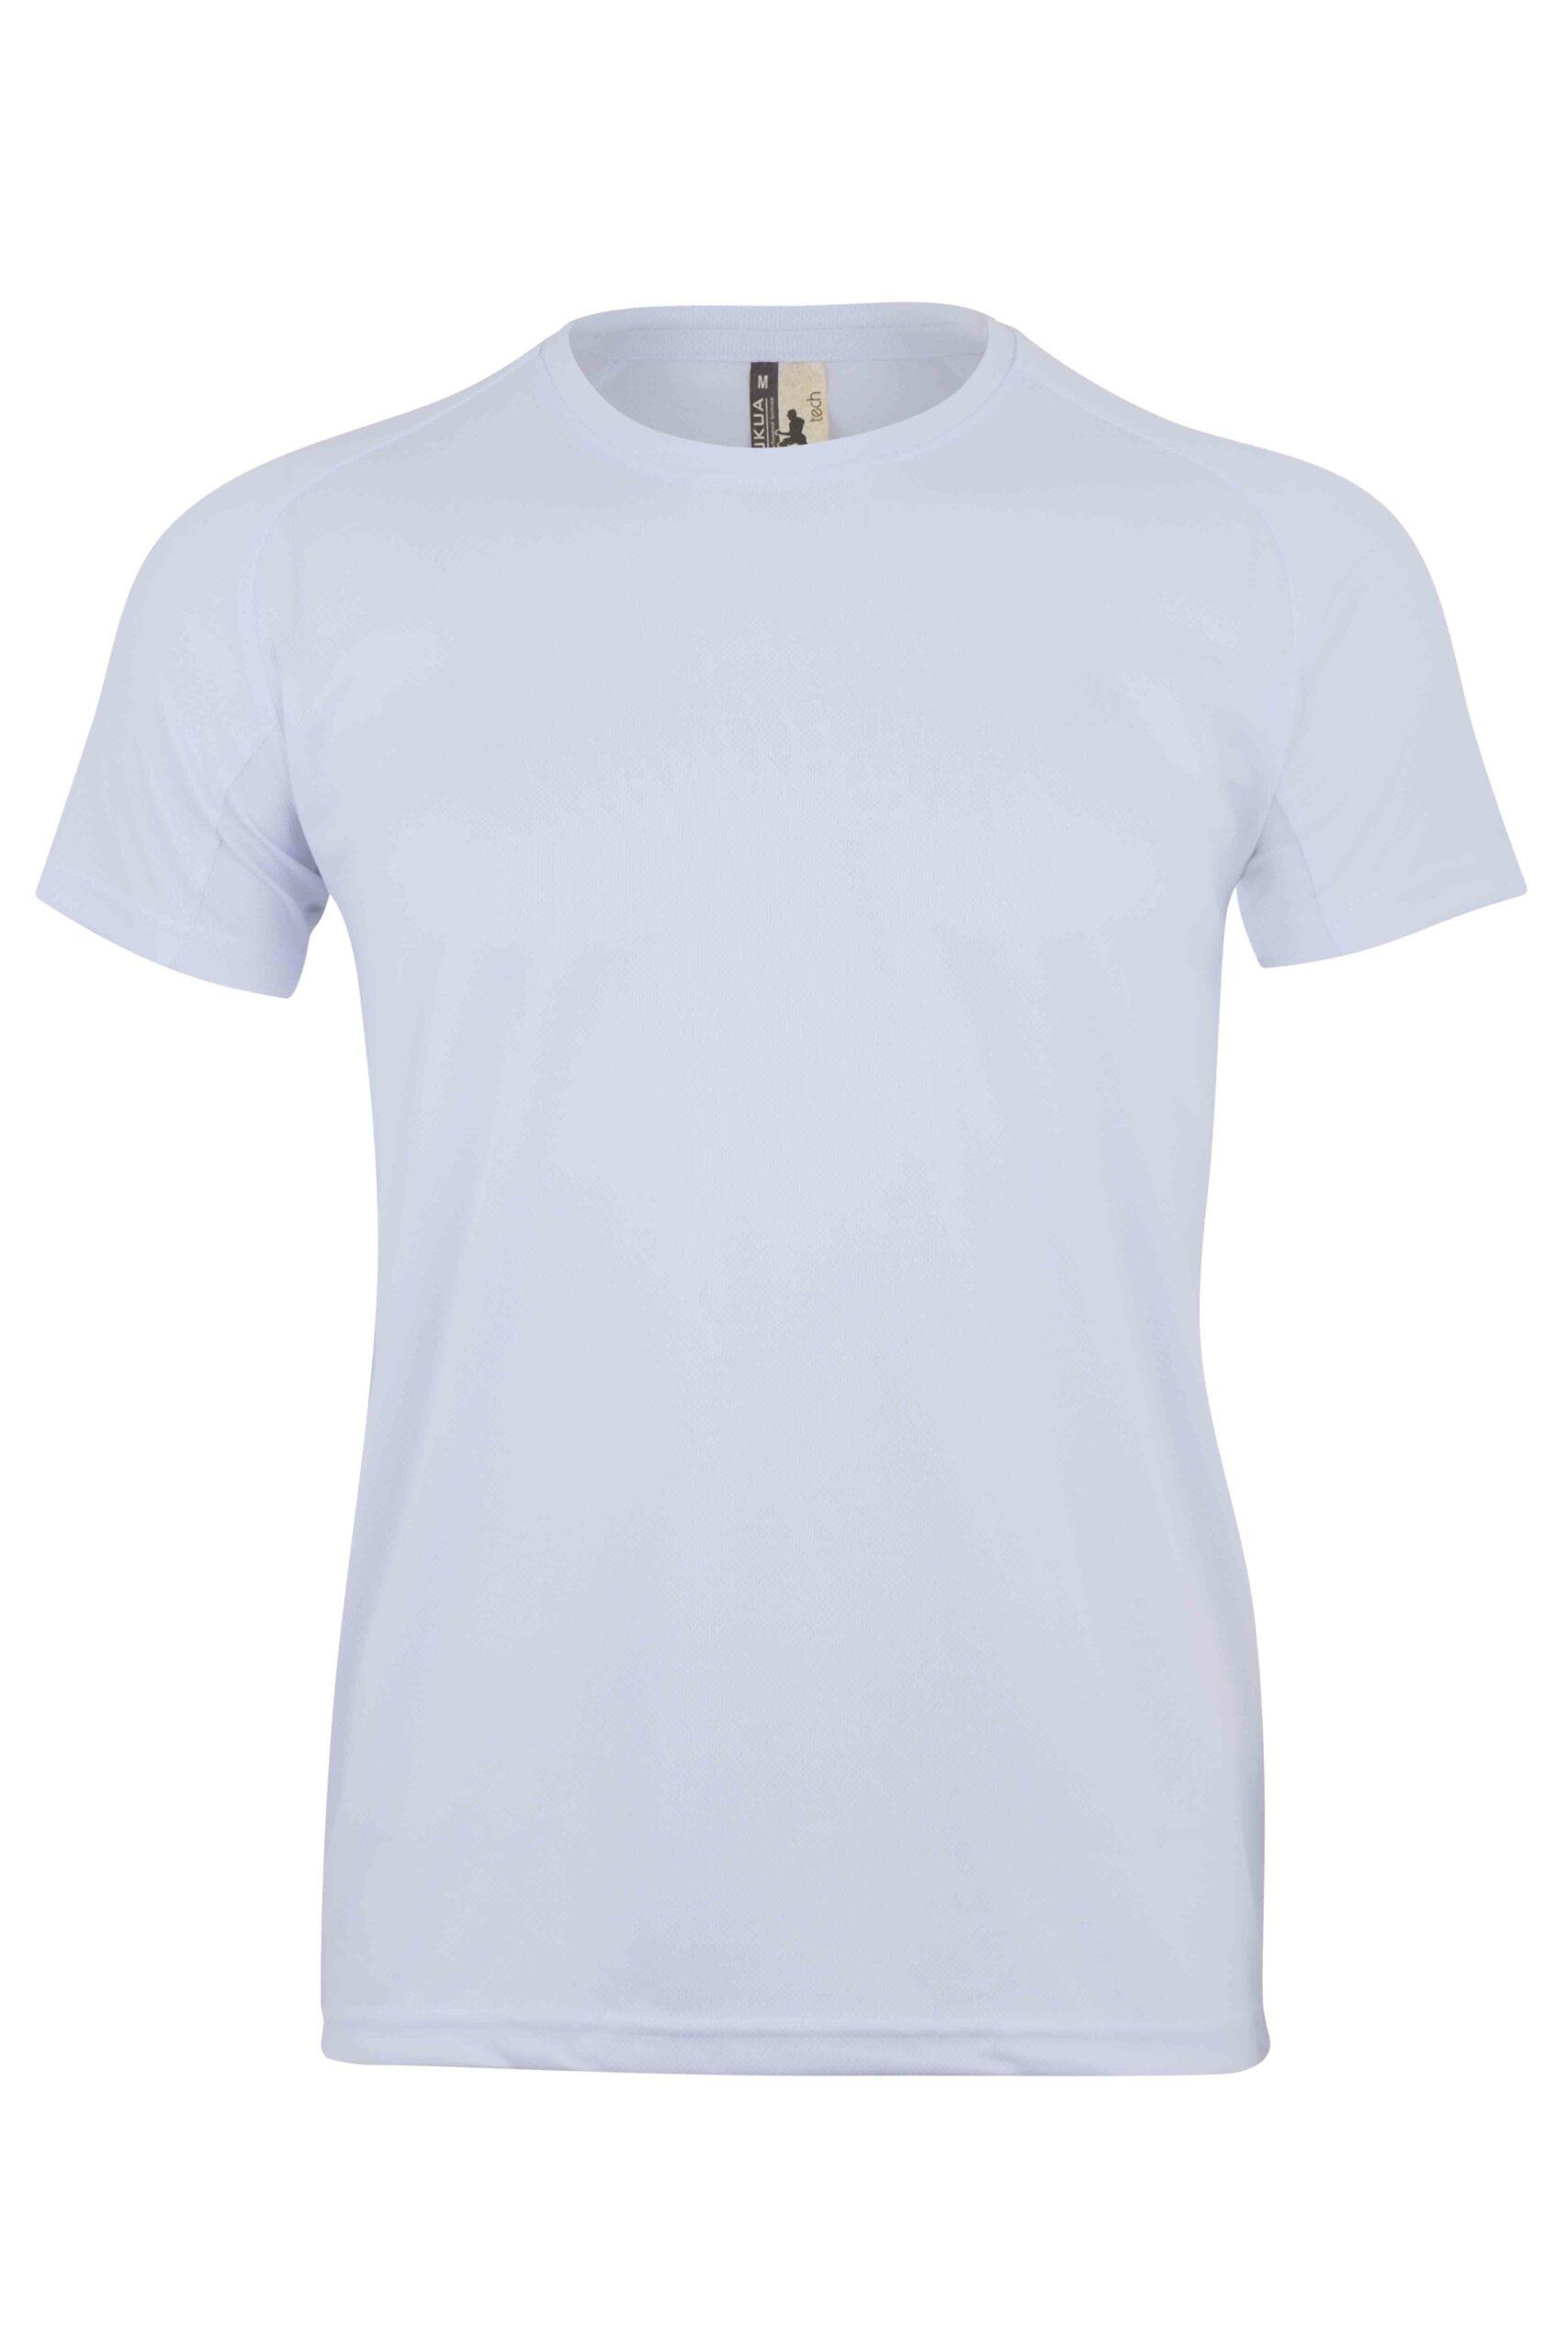 Mukua Mk521v Camiseta TÉcnica Manga Corta NiÑo White